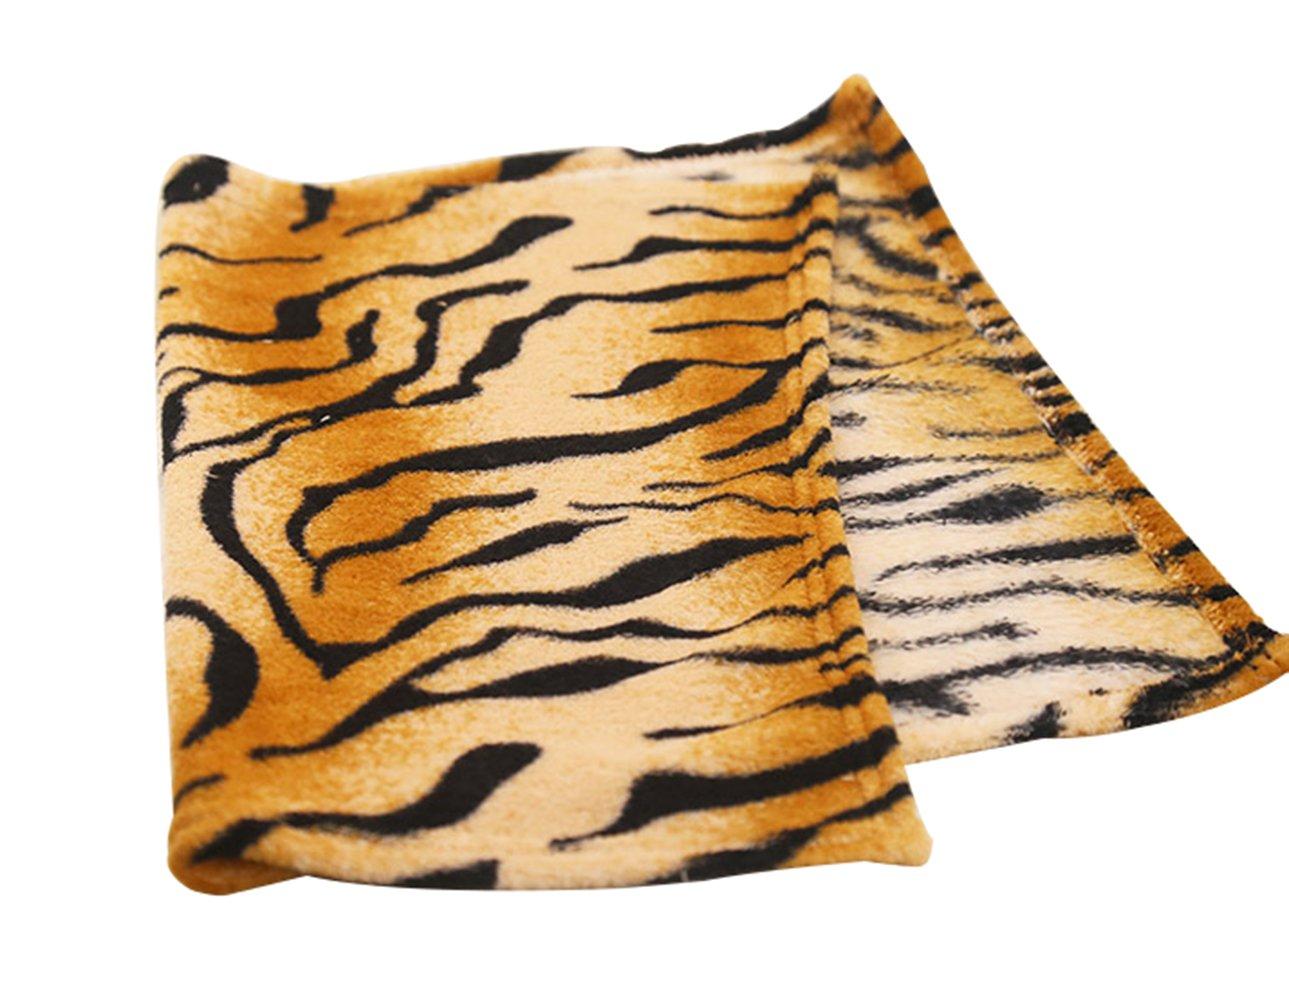 Freerun Coral Fleece Blanket, Warm and Soft All Seasons Blanket, Micro Plush Blanket, Tiger Print Pattern (L)